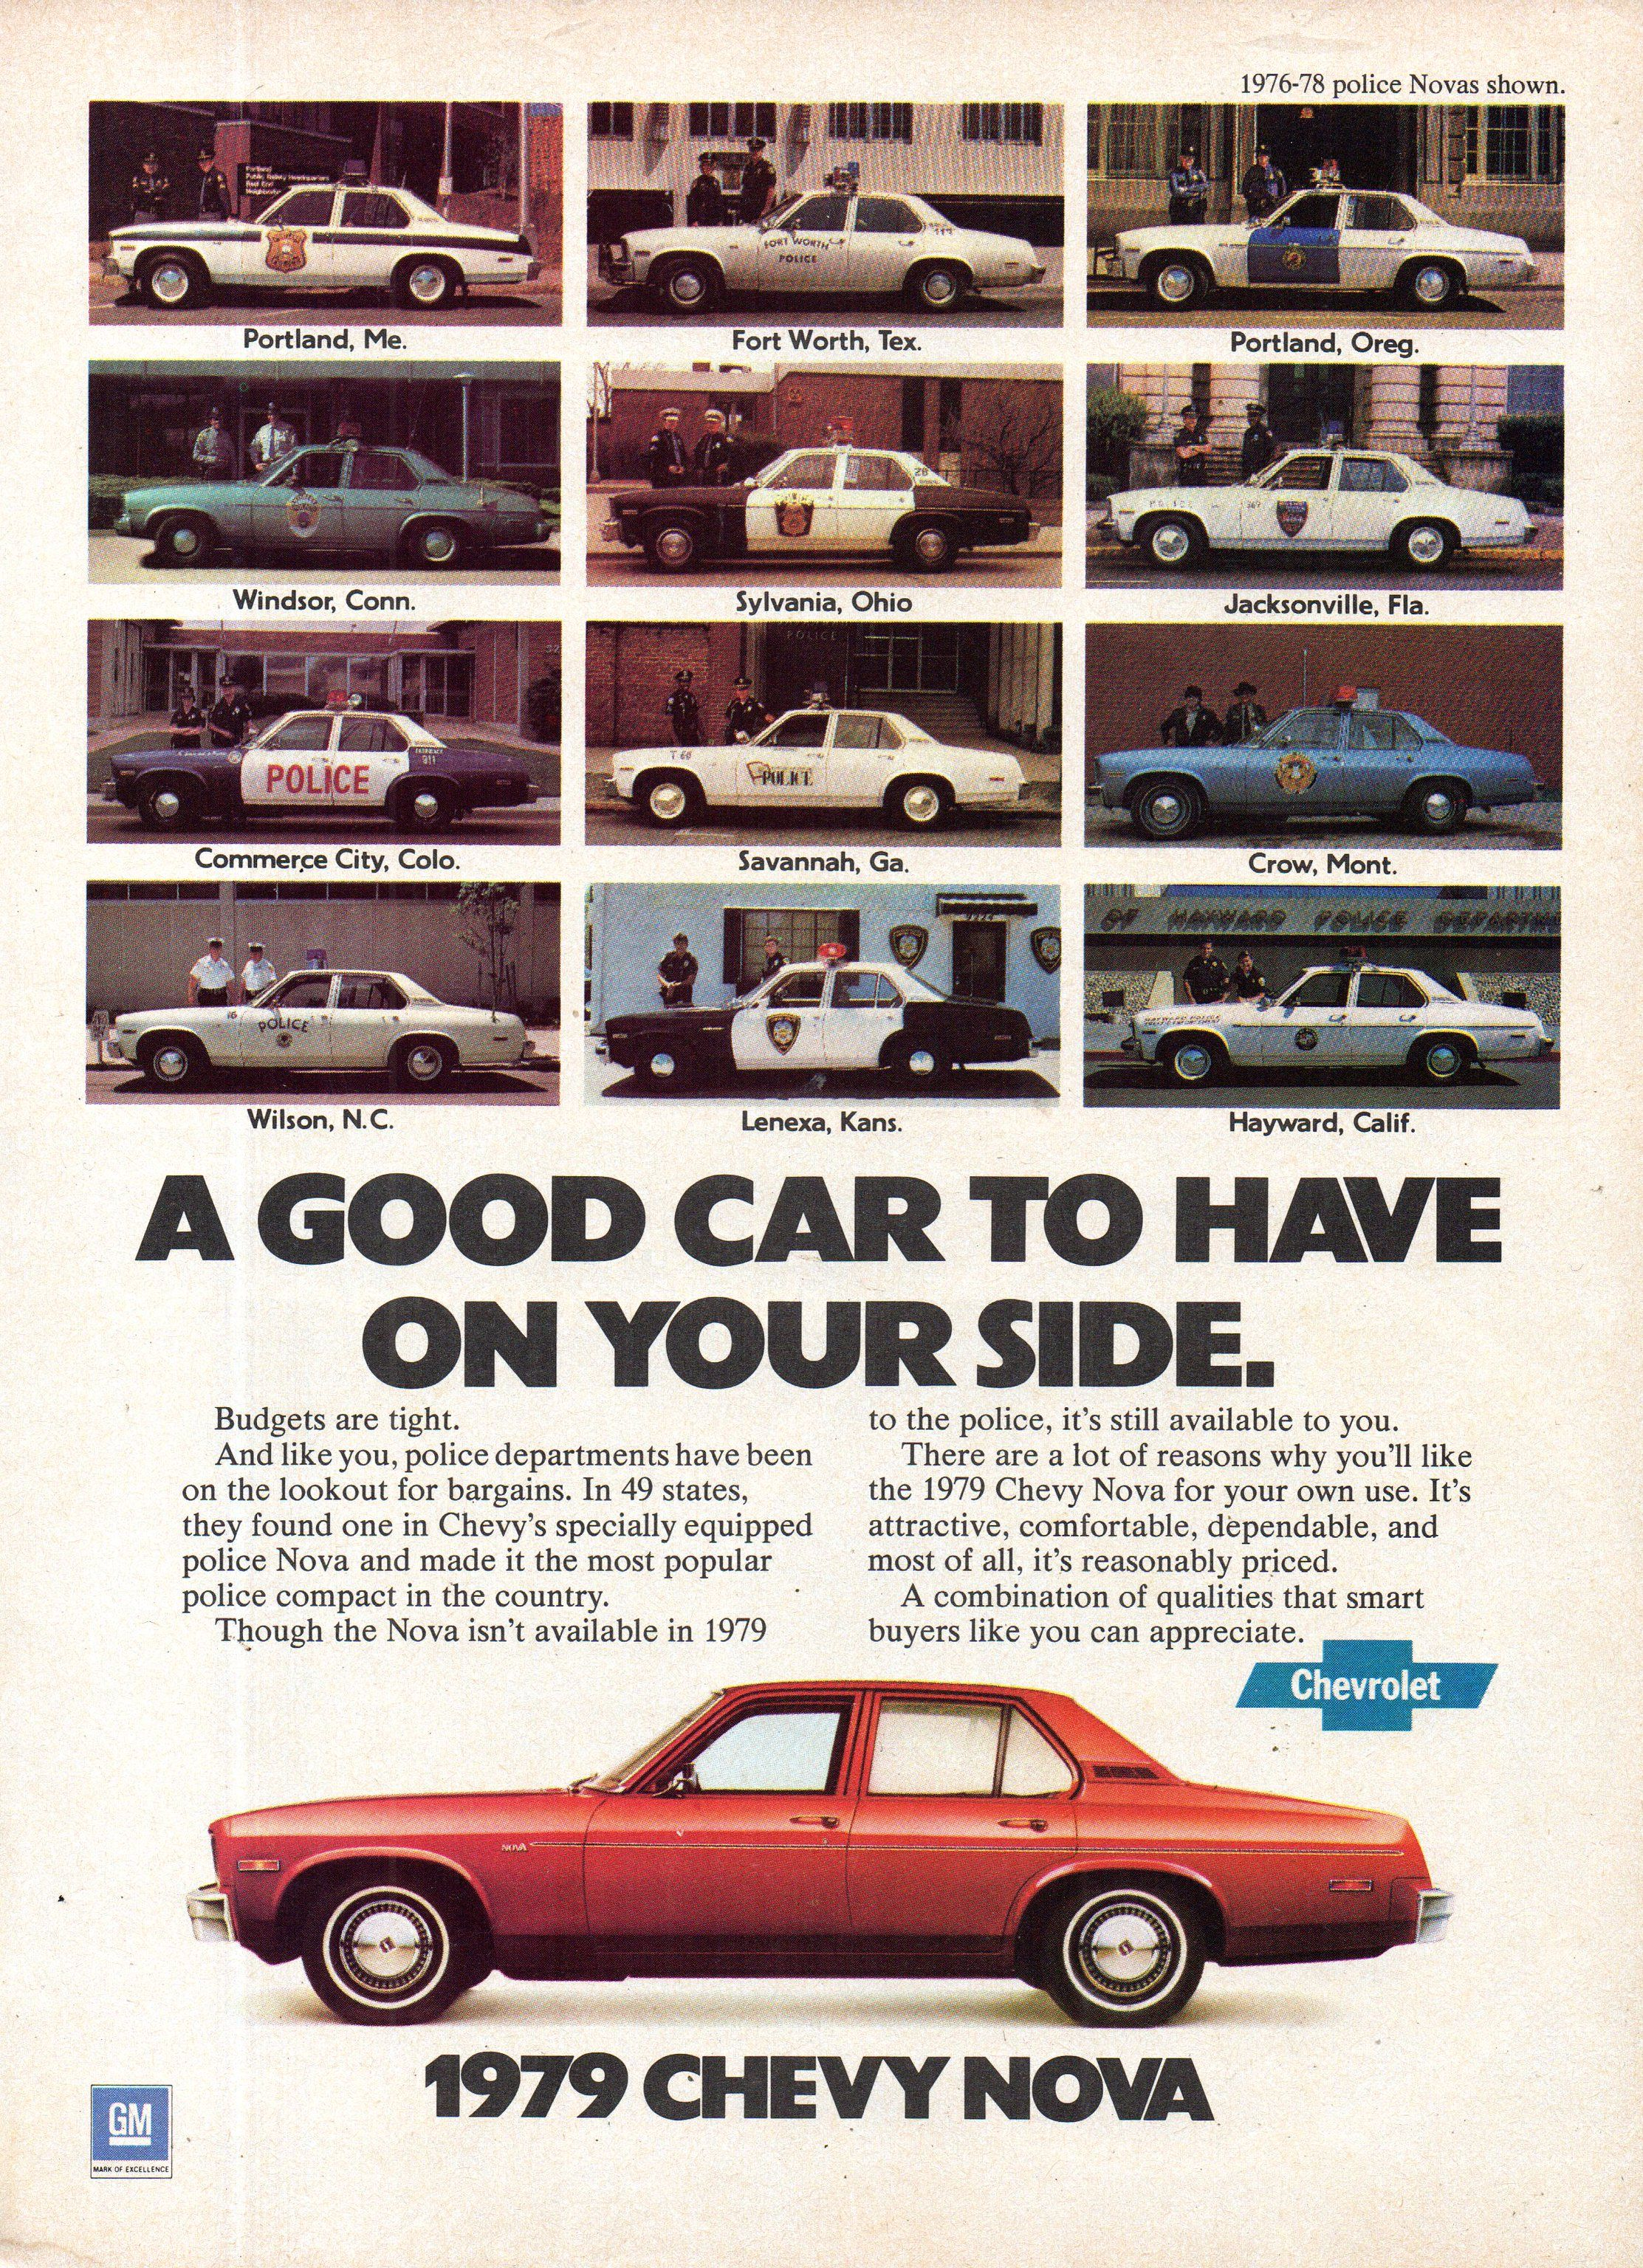 1979 Chevrolet Chevy Nova Sedan USA Original Magazine Advertisement